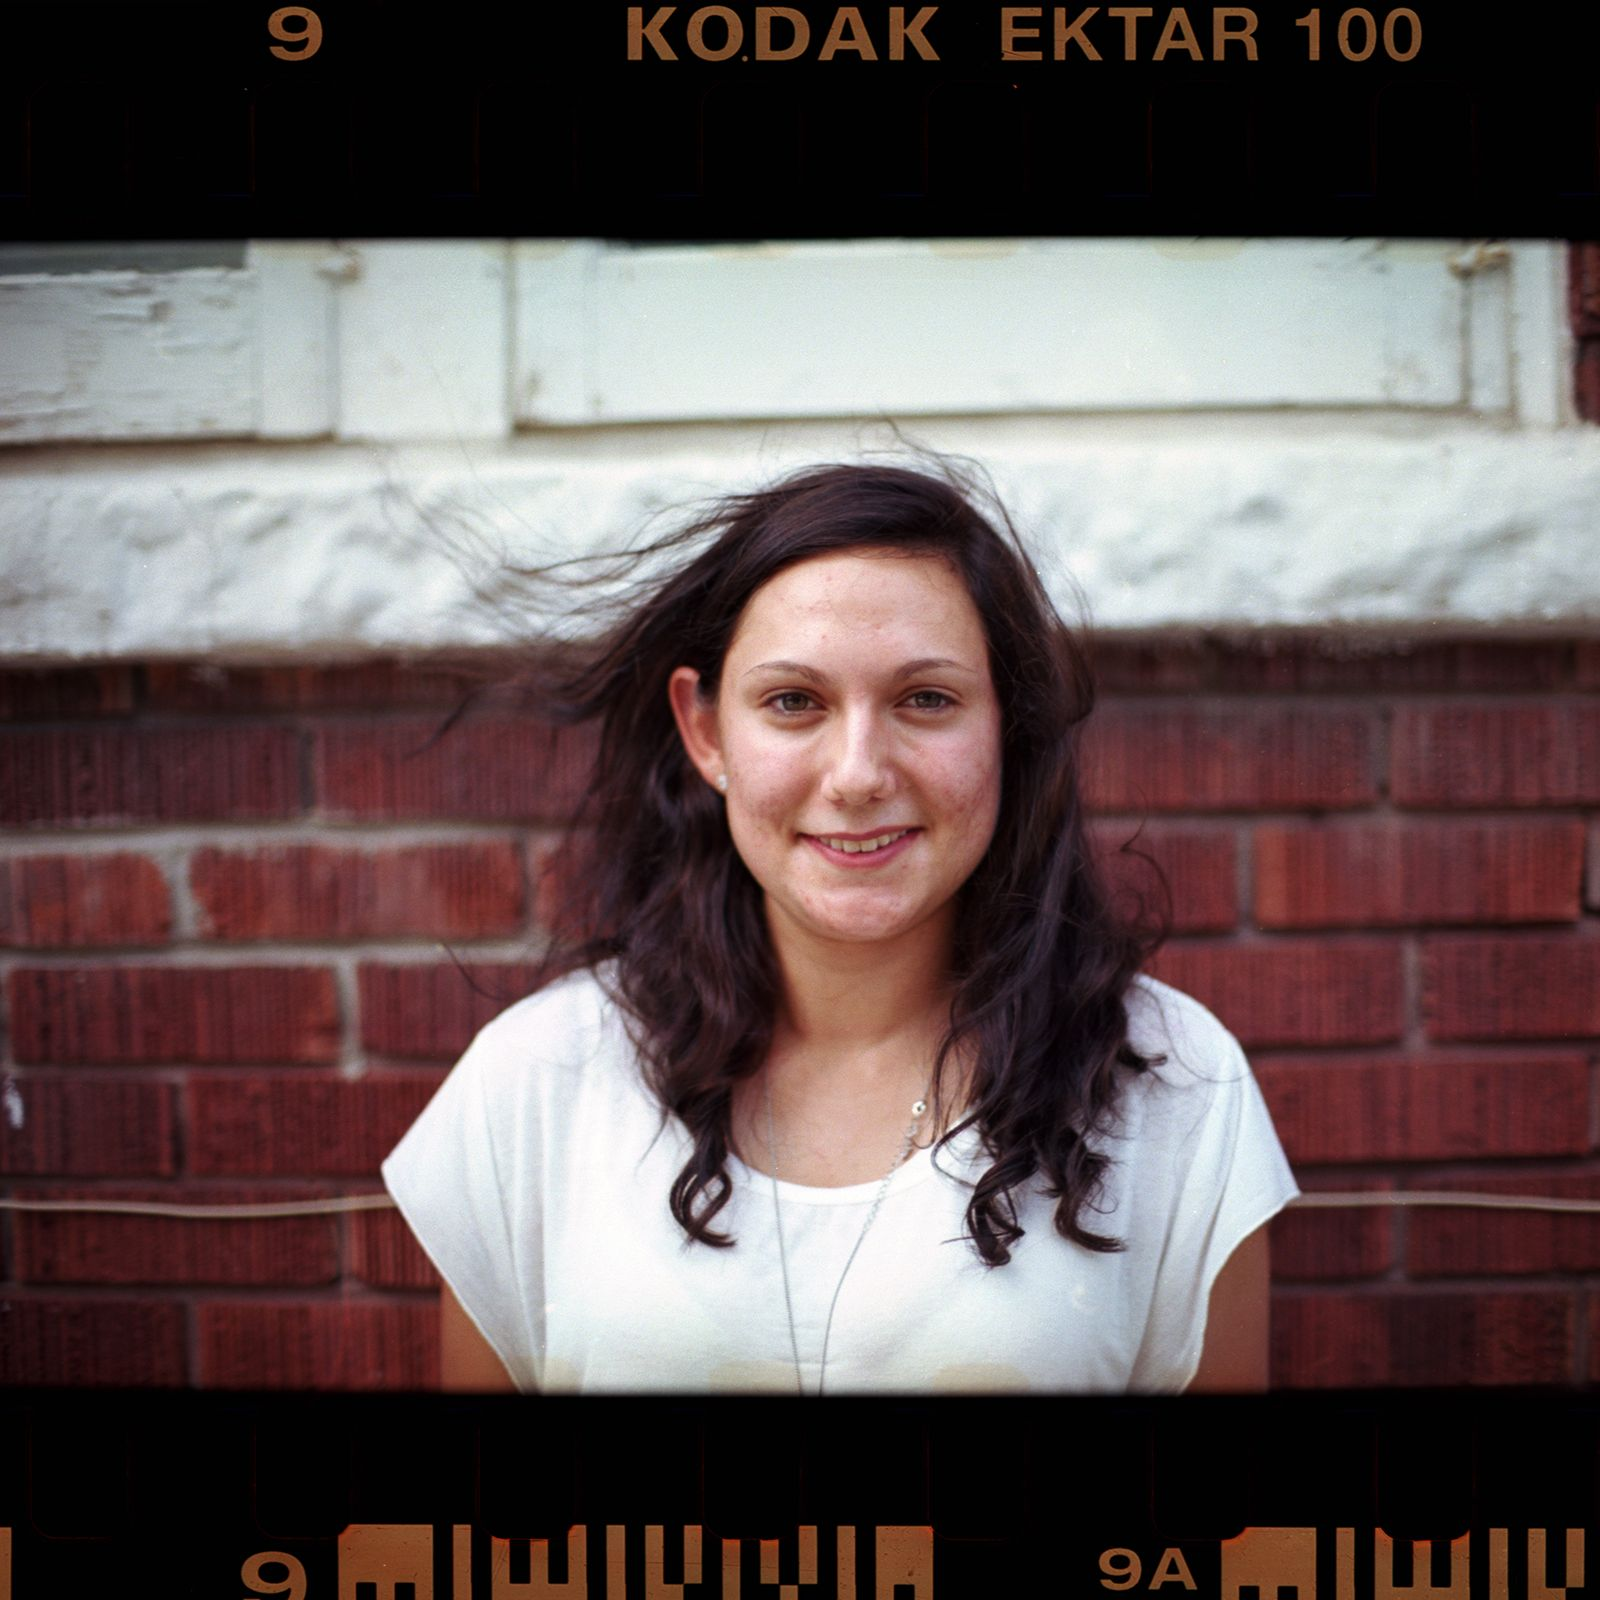 No 26. Emma Waterloo, Ontario – Canadians on film Canon AL – Kodak Ektar 100 – Canon FD 50mm f1.2 #Canon #AL #35mm #KodakEktar100 #Kodak #Film #Canadiansonfilm